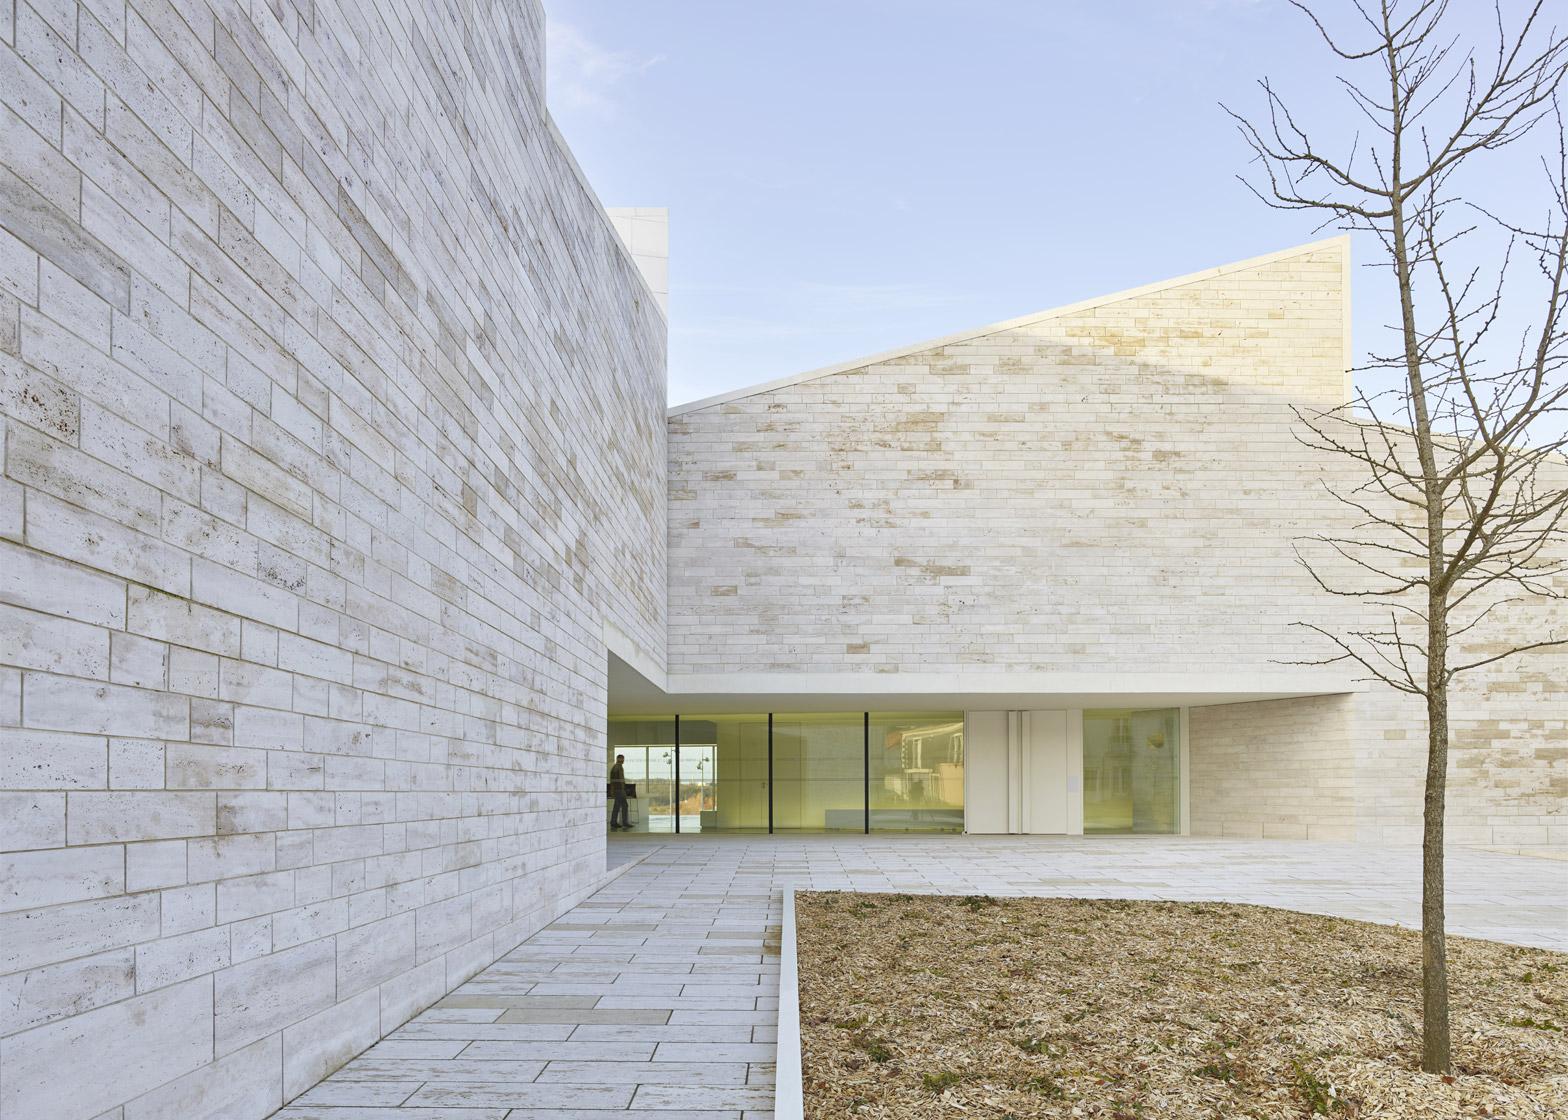 Cour et Jardin by Fernandez & Serres